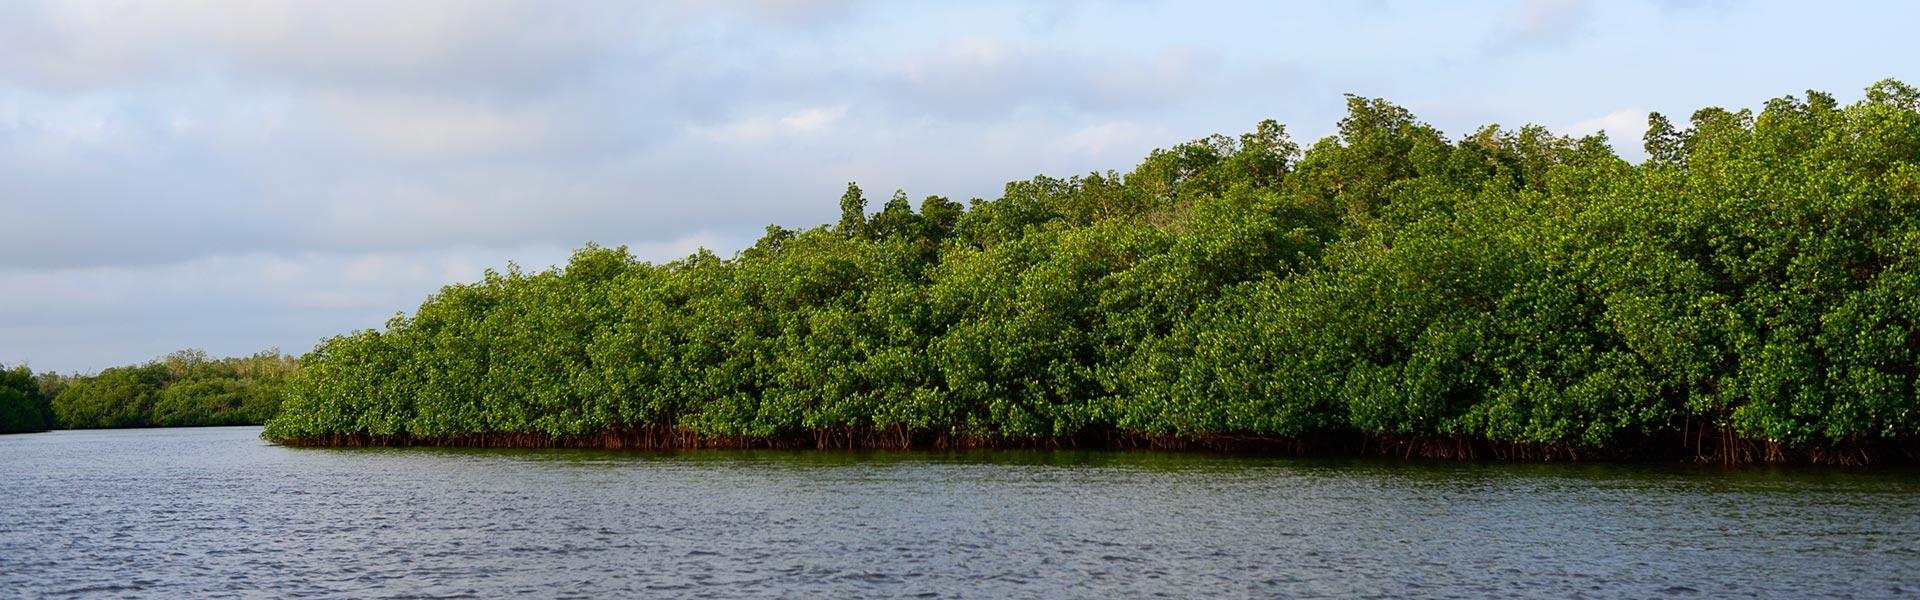 parque nacional orangoportada2